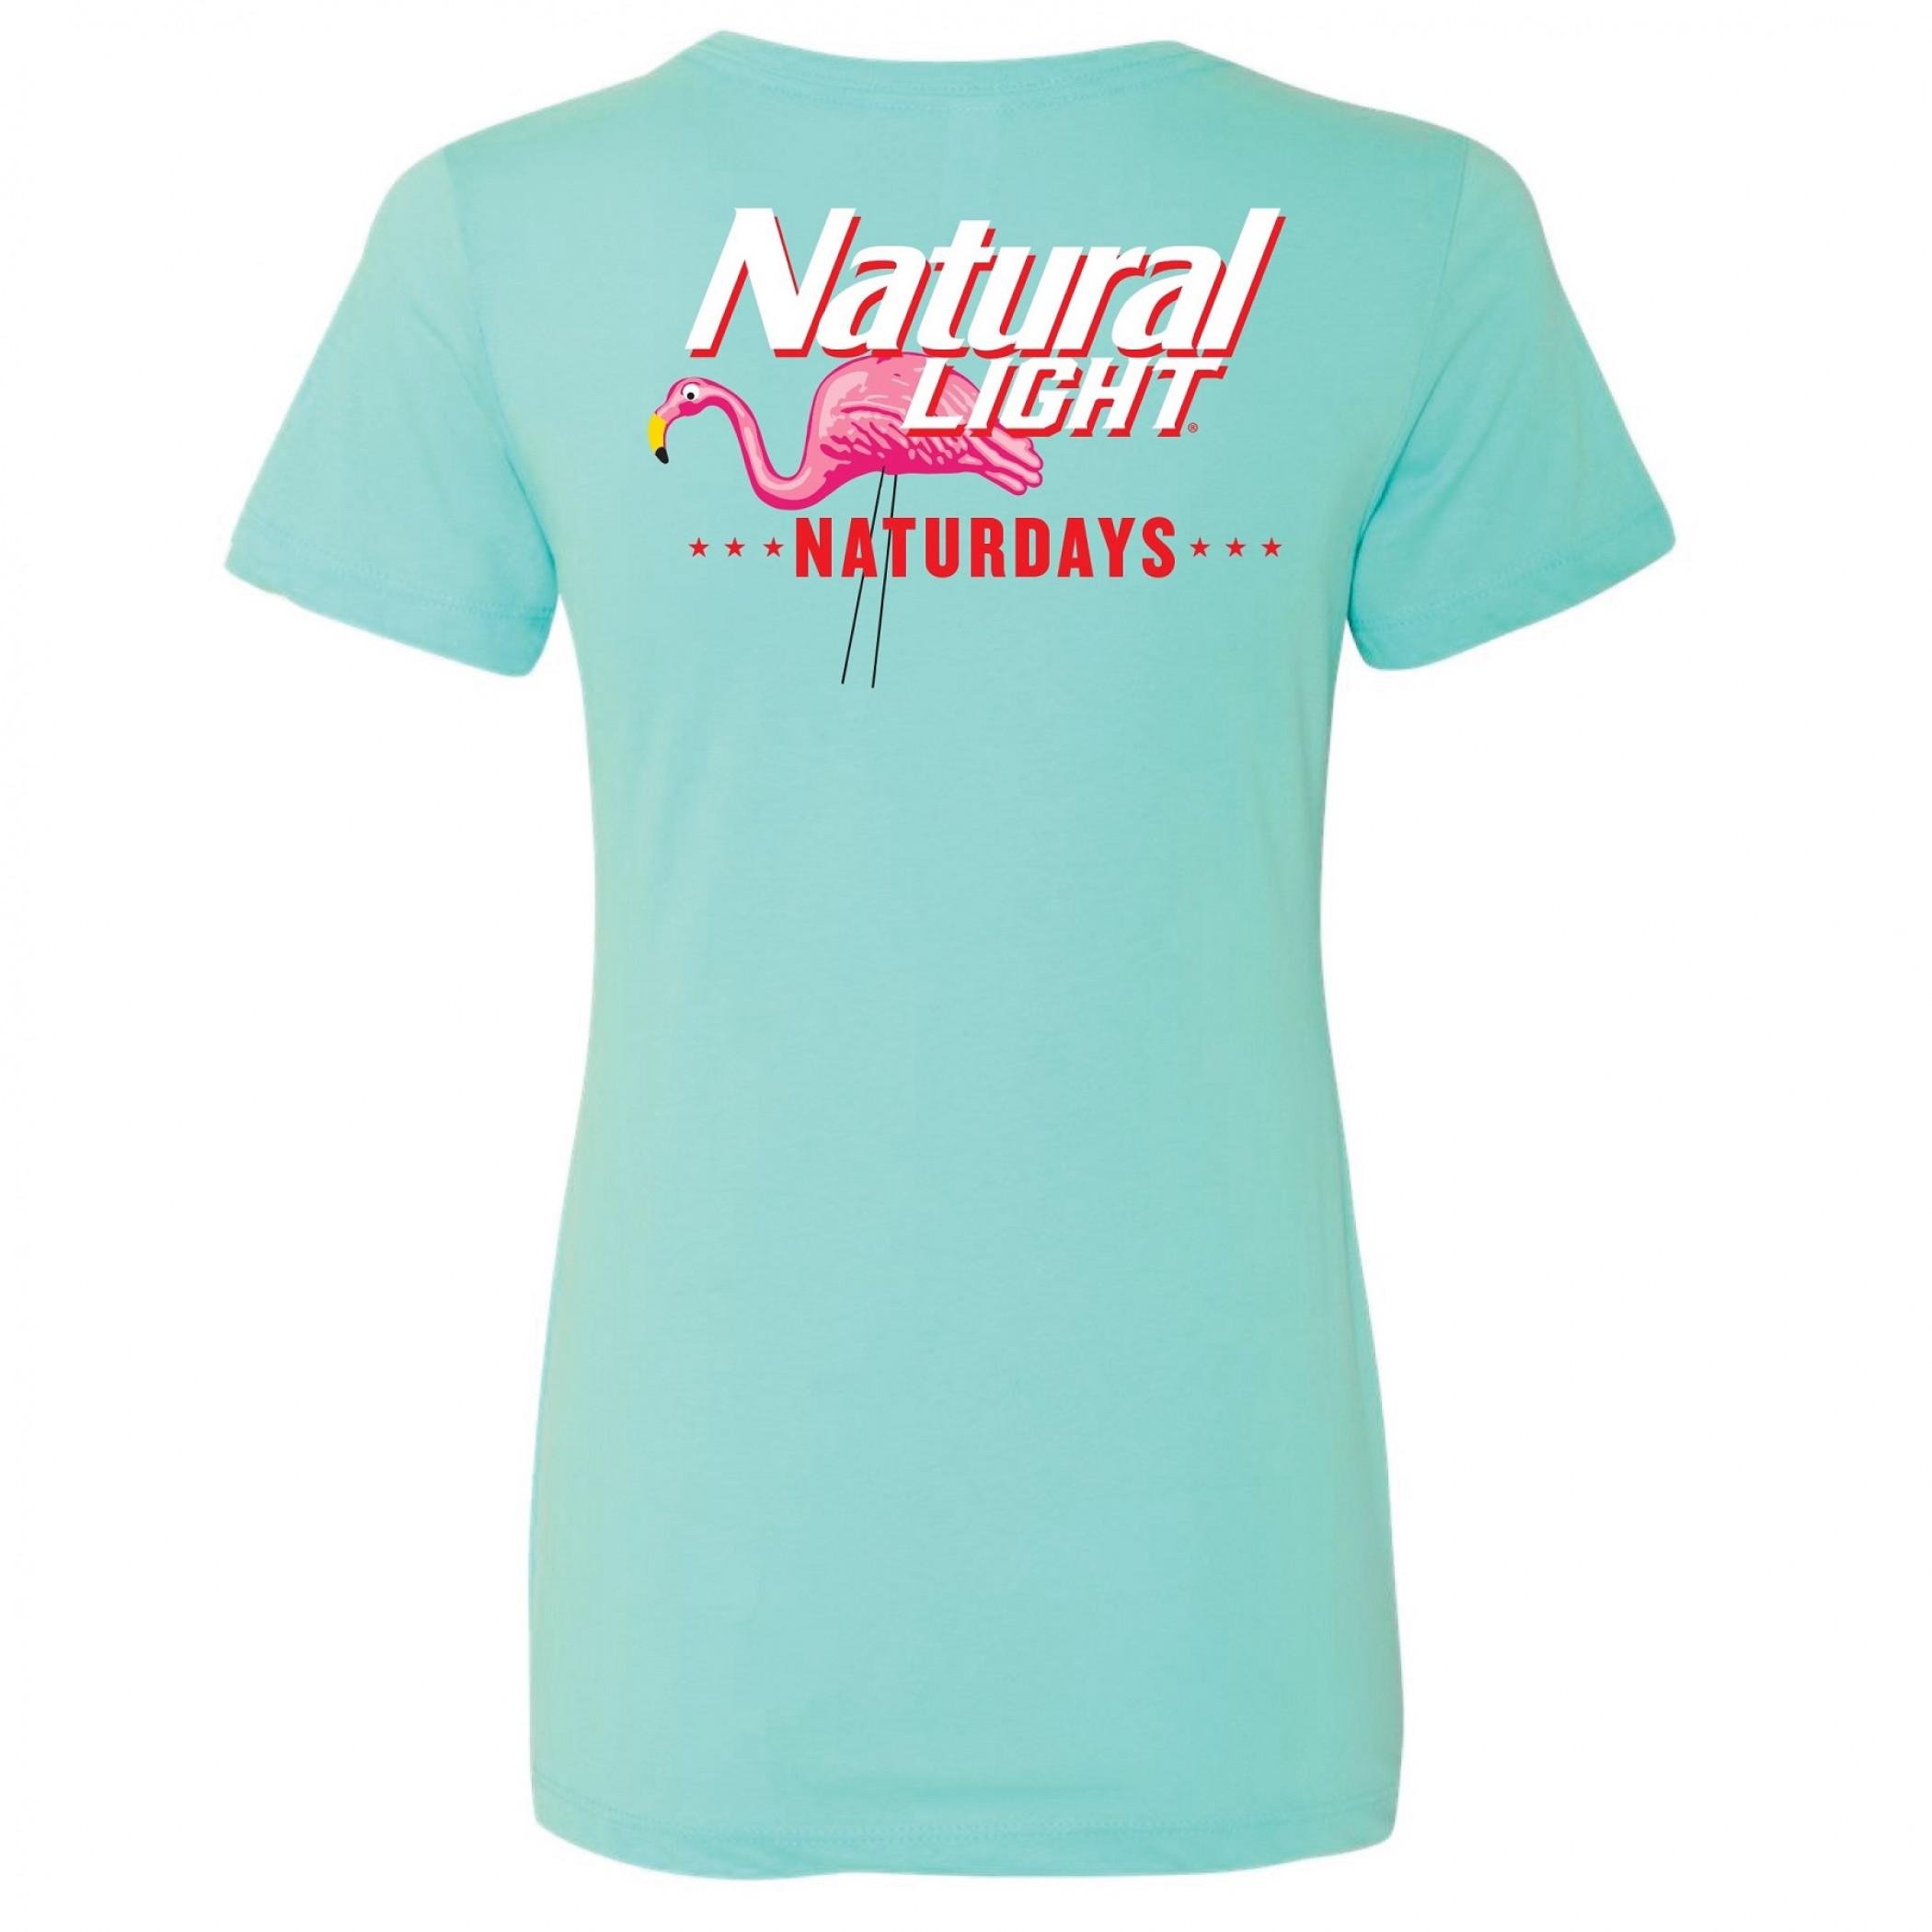 Natural Light Naturdays Flamingo Women's T-Shirt